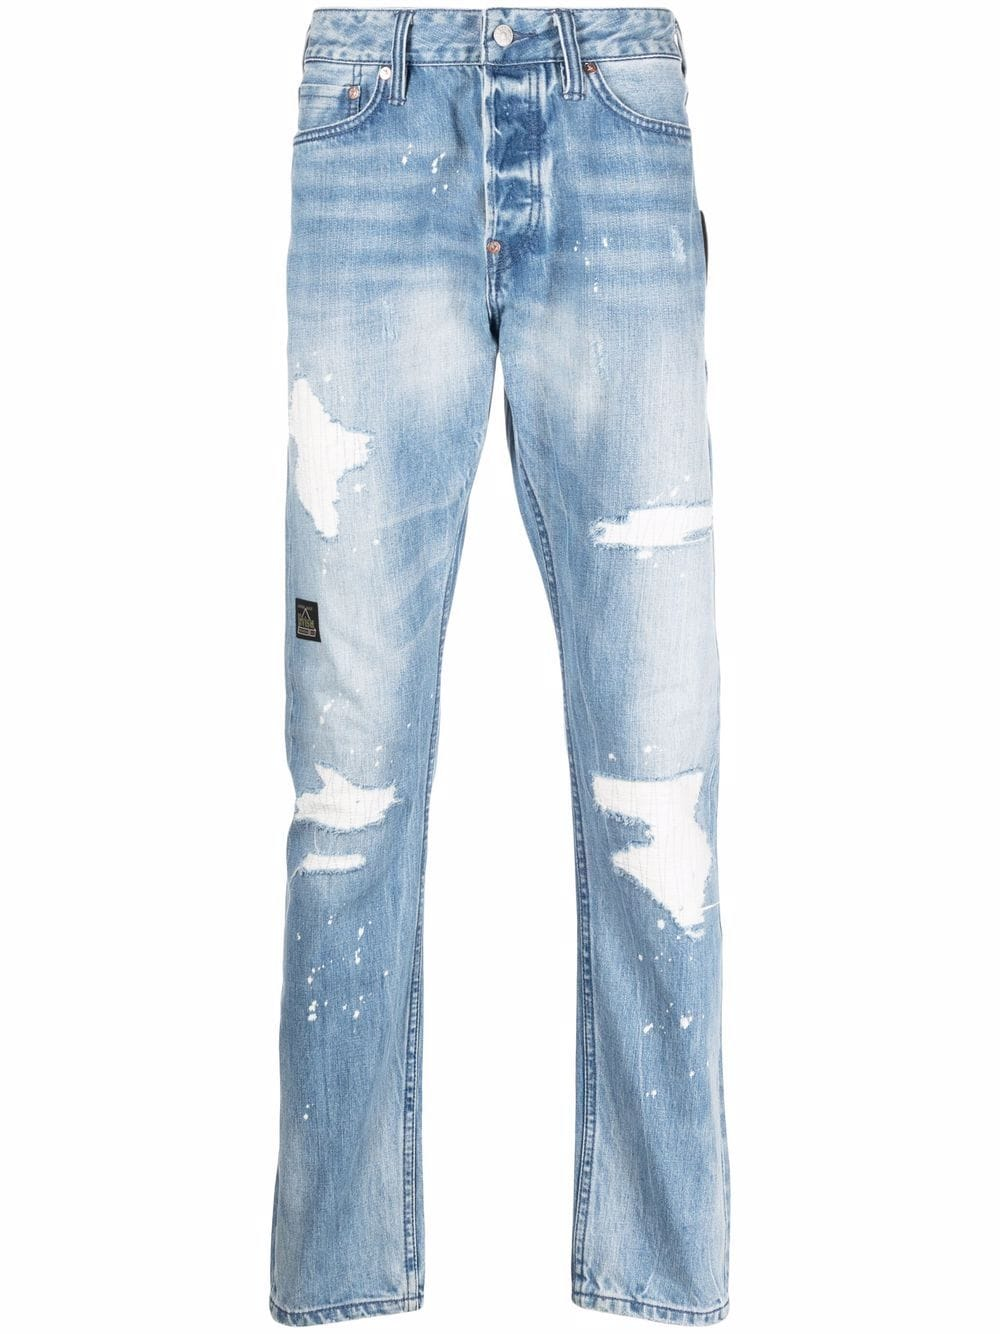 <p class='small-title'>EVISU</p>Distressed Finish Jeans